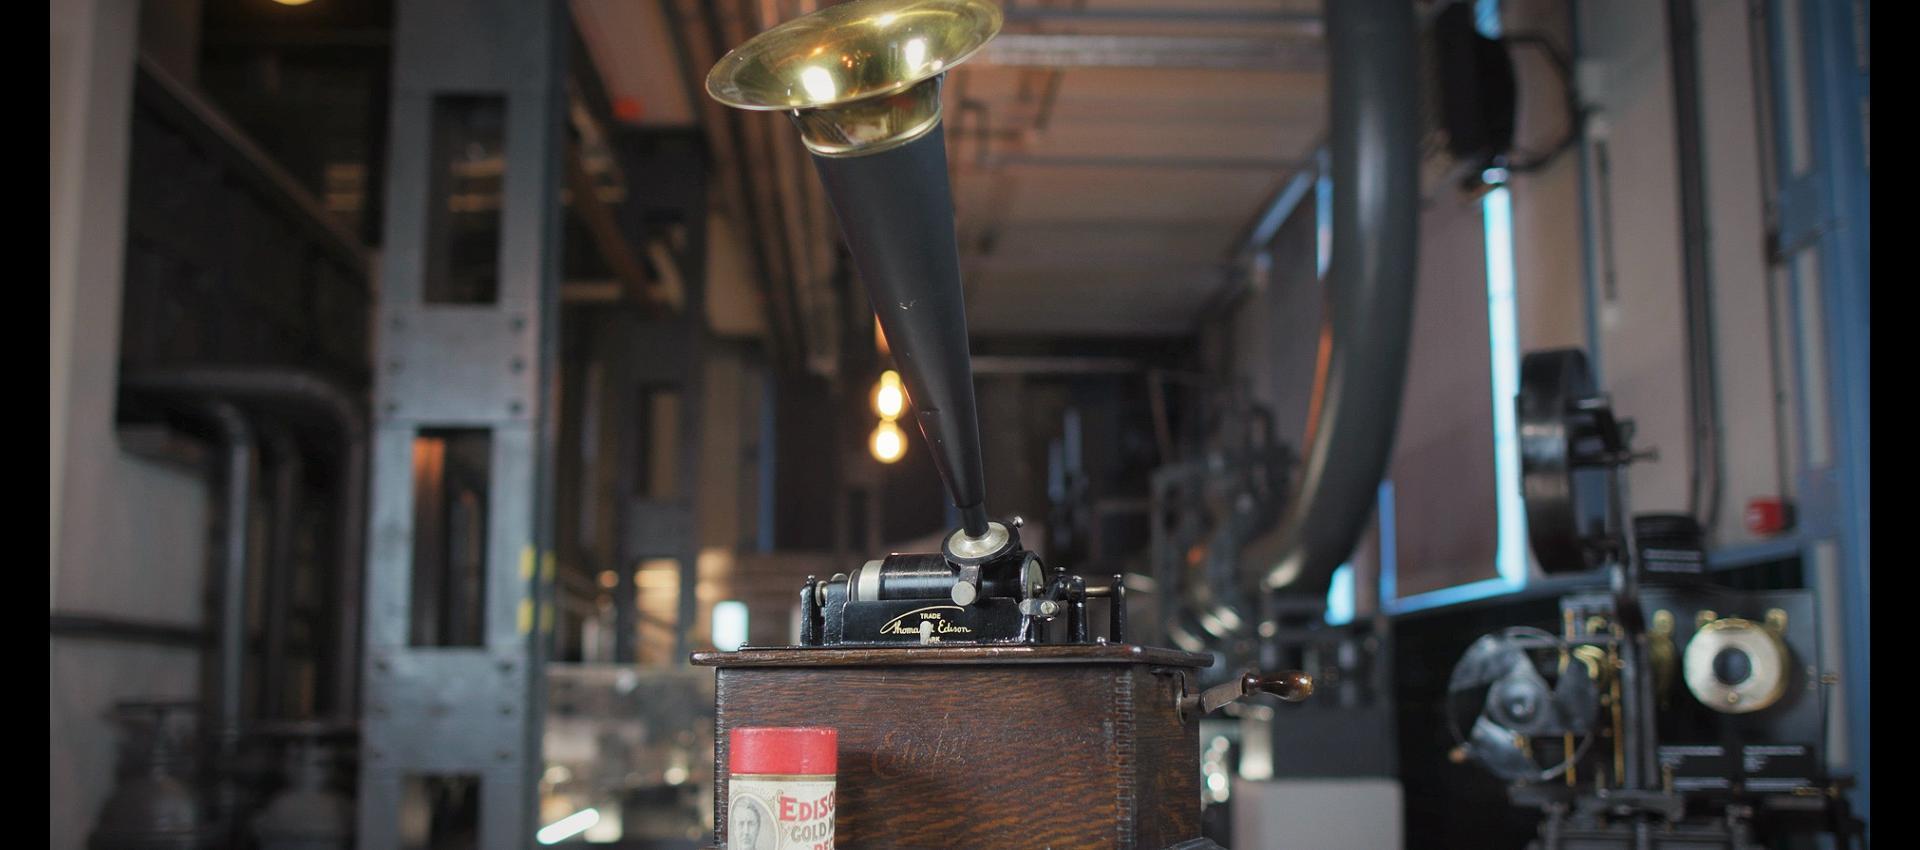 Fonograf i kalejdoskop